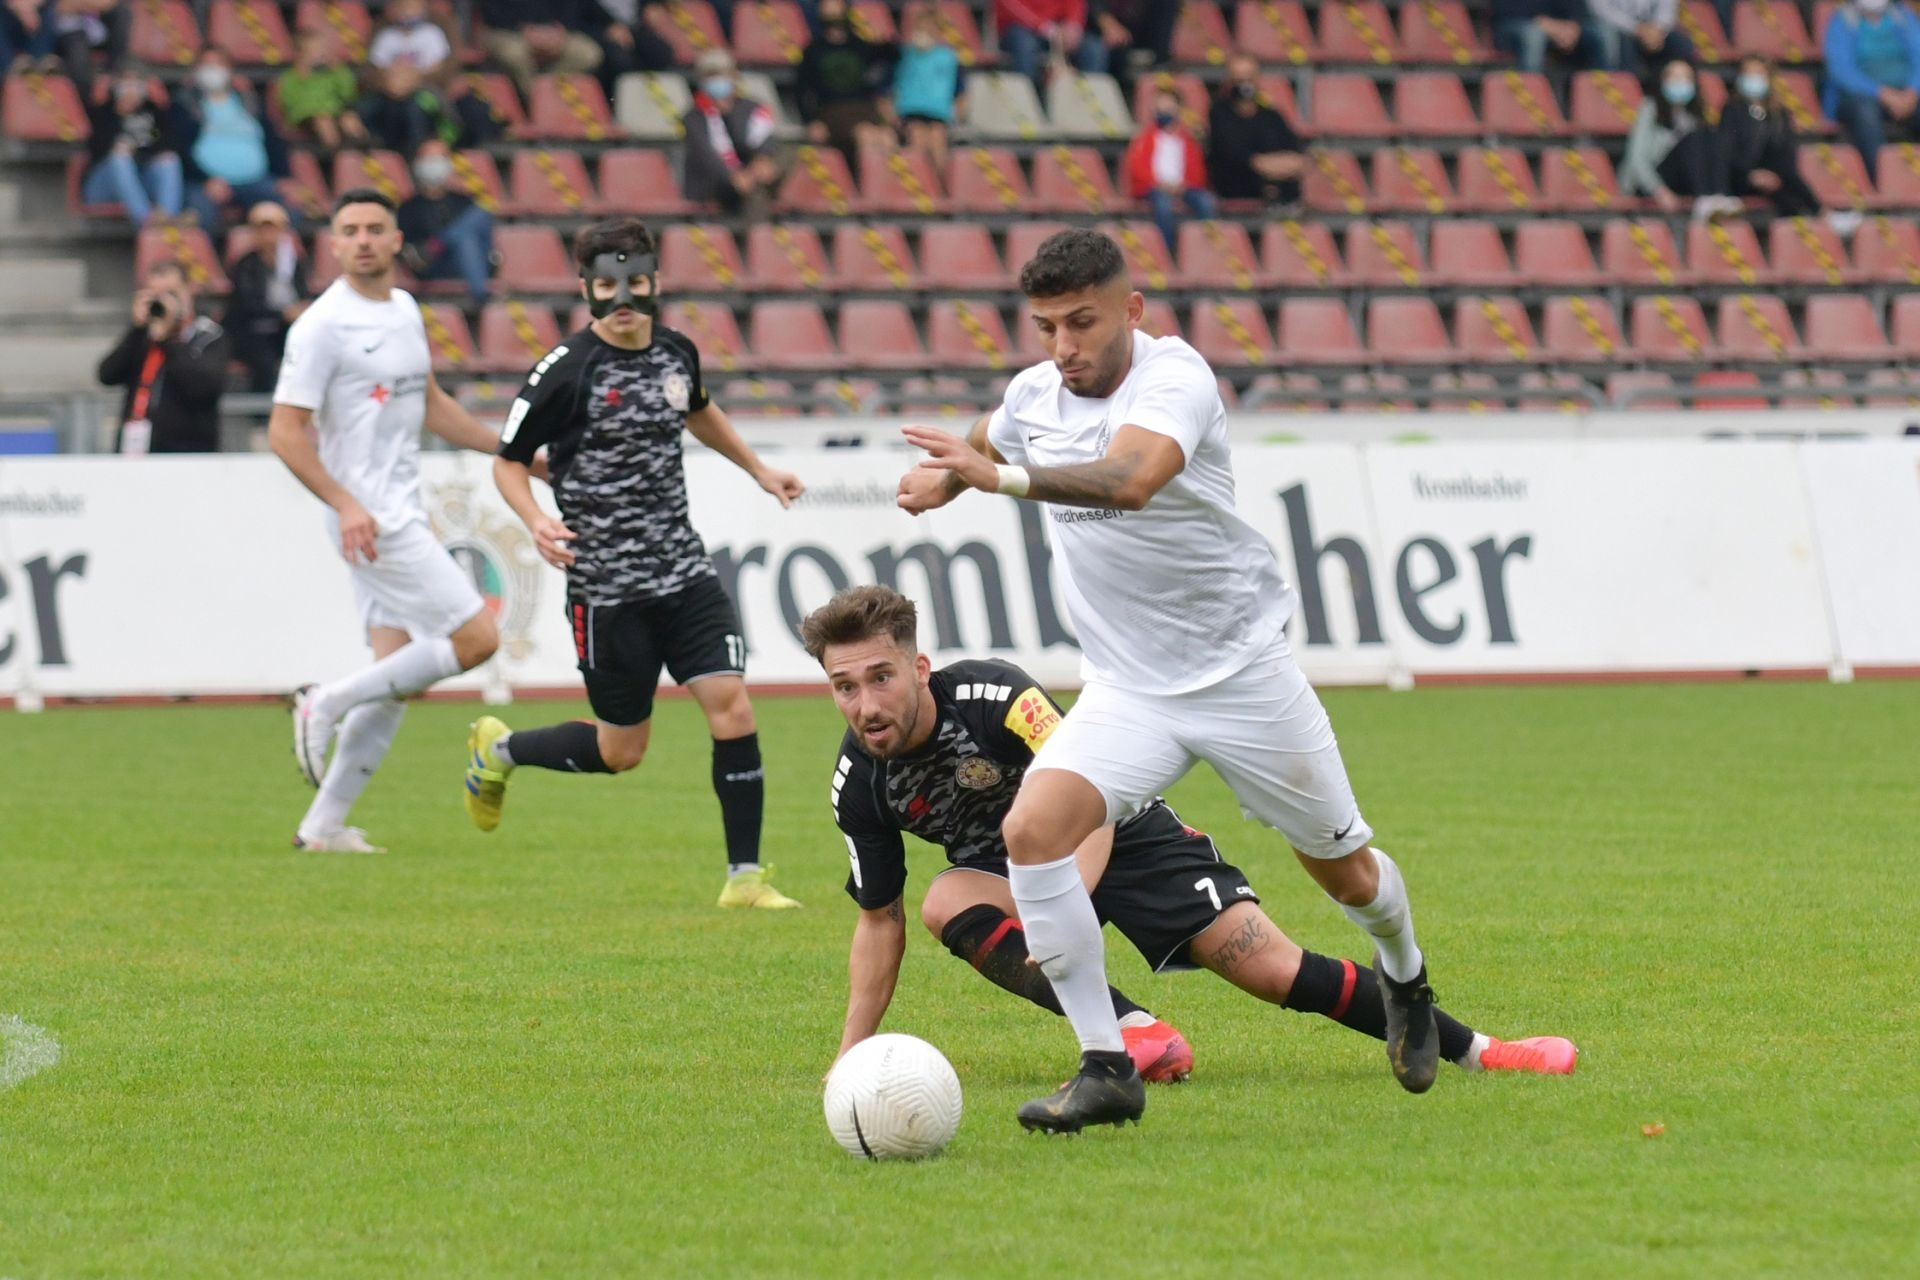 Regionalliga Südwest 2020/21, KSV Hessen Kassel, Rot-Weiss-Koblenz, Endstand 1:1, Nael Najjar